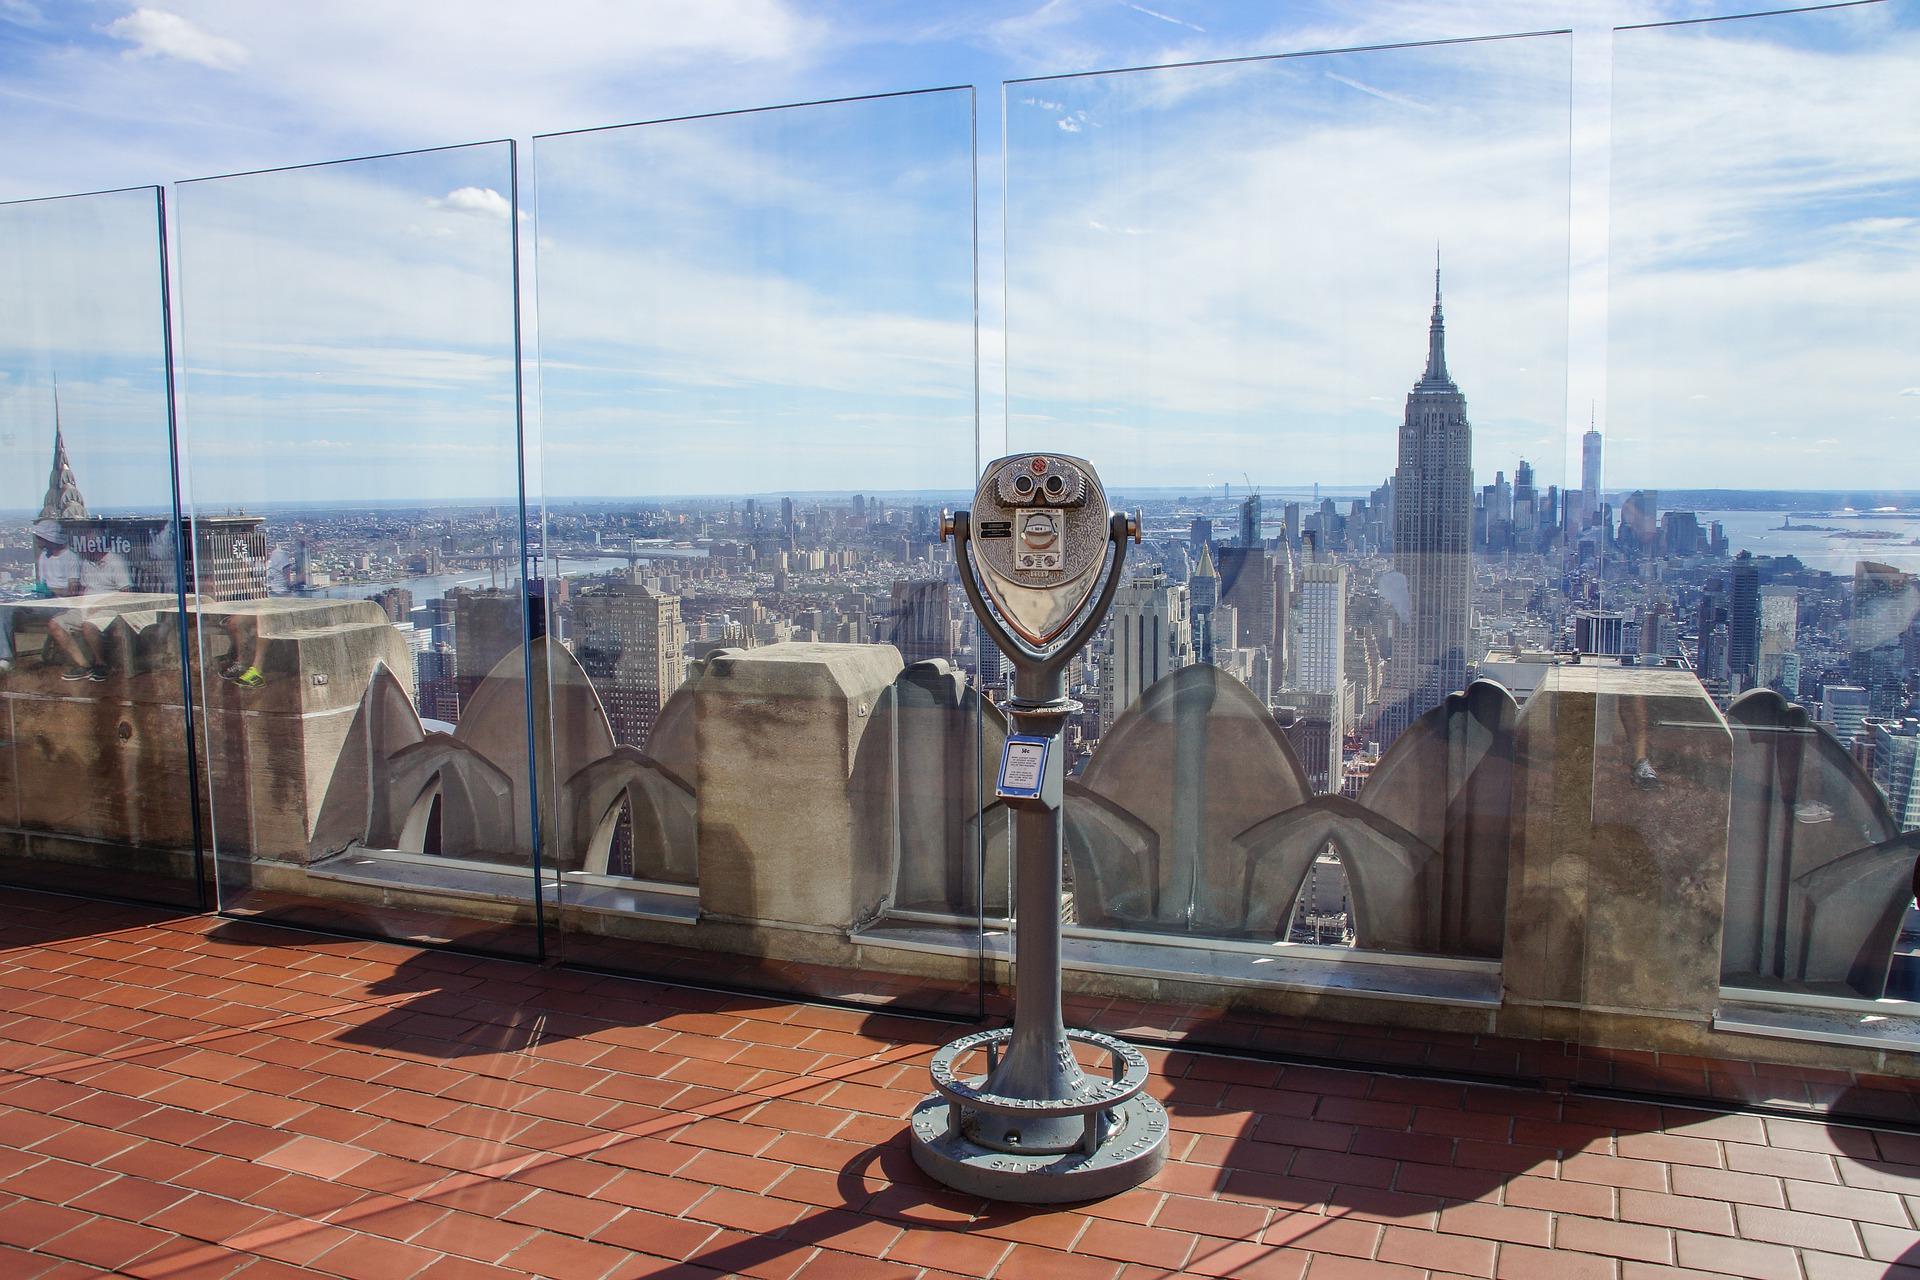 Top of The Rock - Rockefeller Center